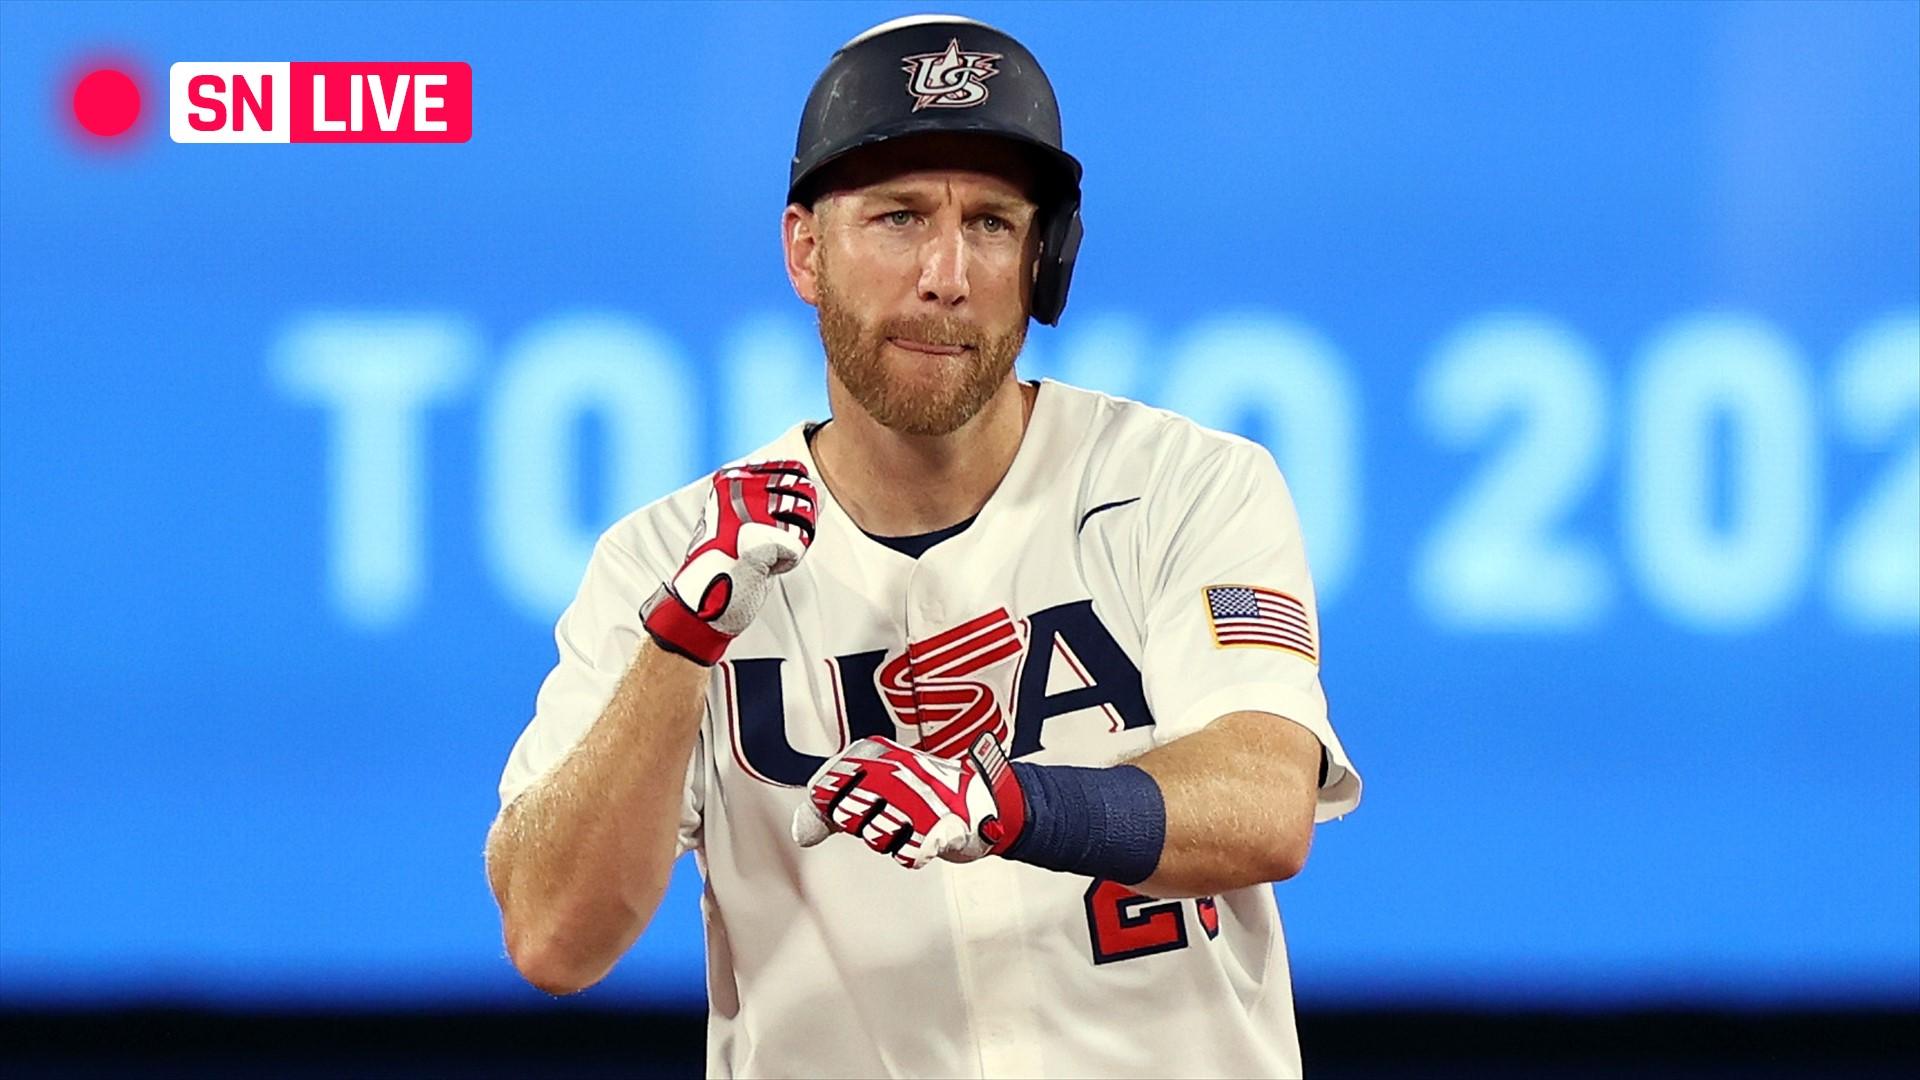 USA Baseball vs. Japan Live Score, Updates, 2021 Olympic Gold Medal Game Highlights